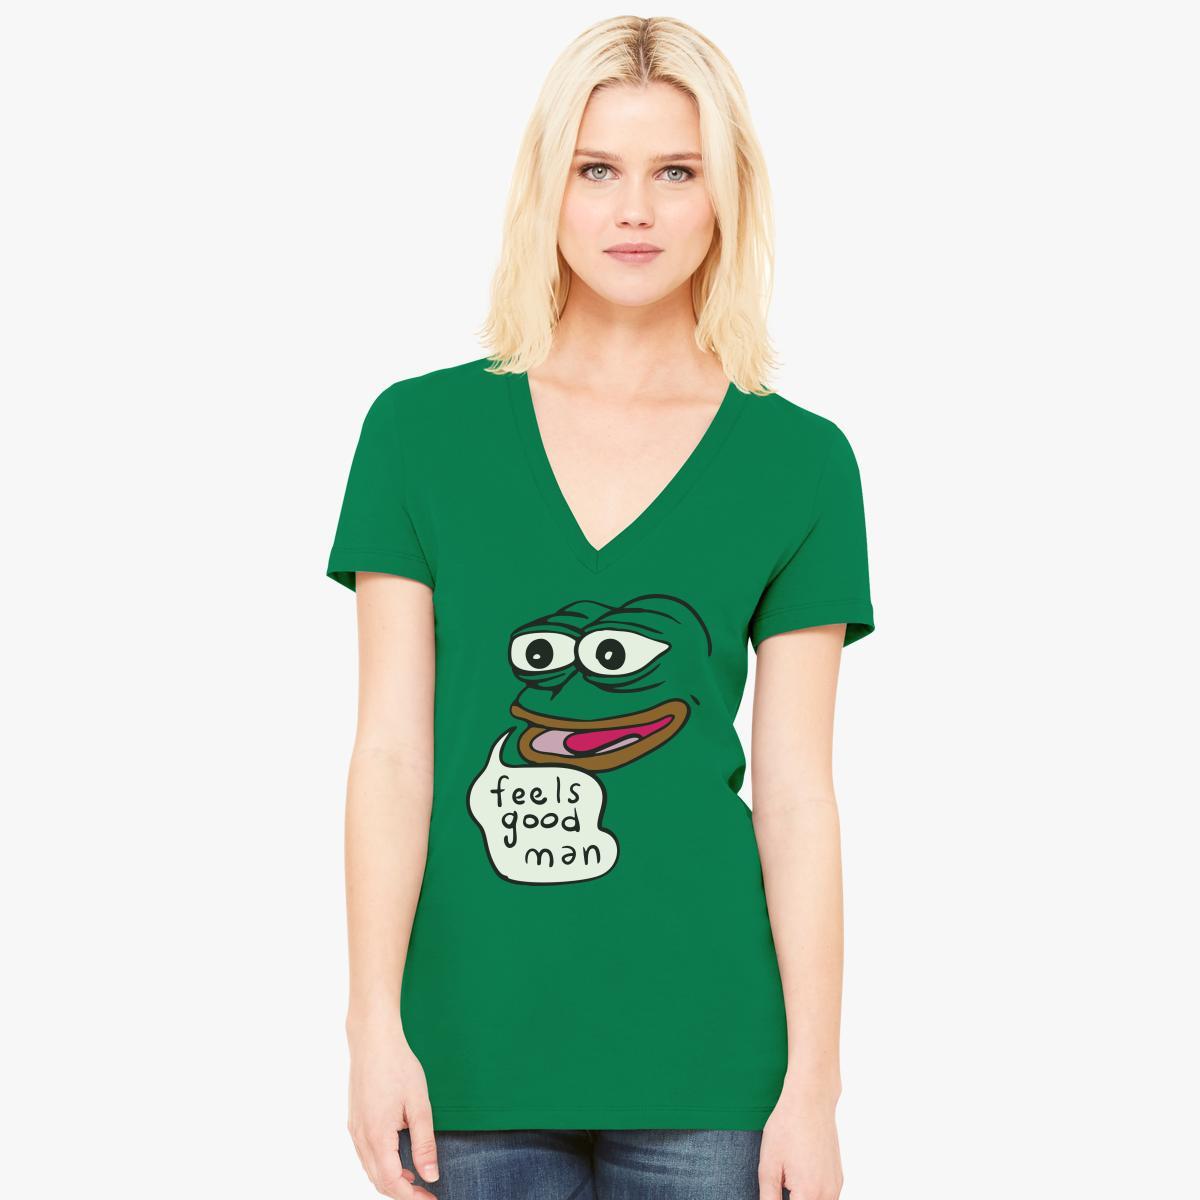 Feels Good Man Womenu0027s V Neck T Shirt